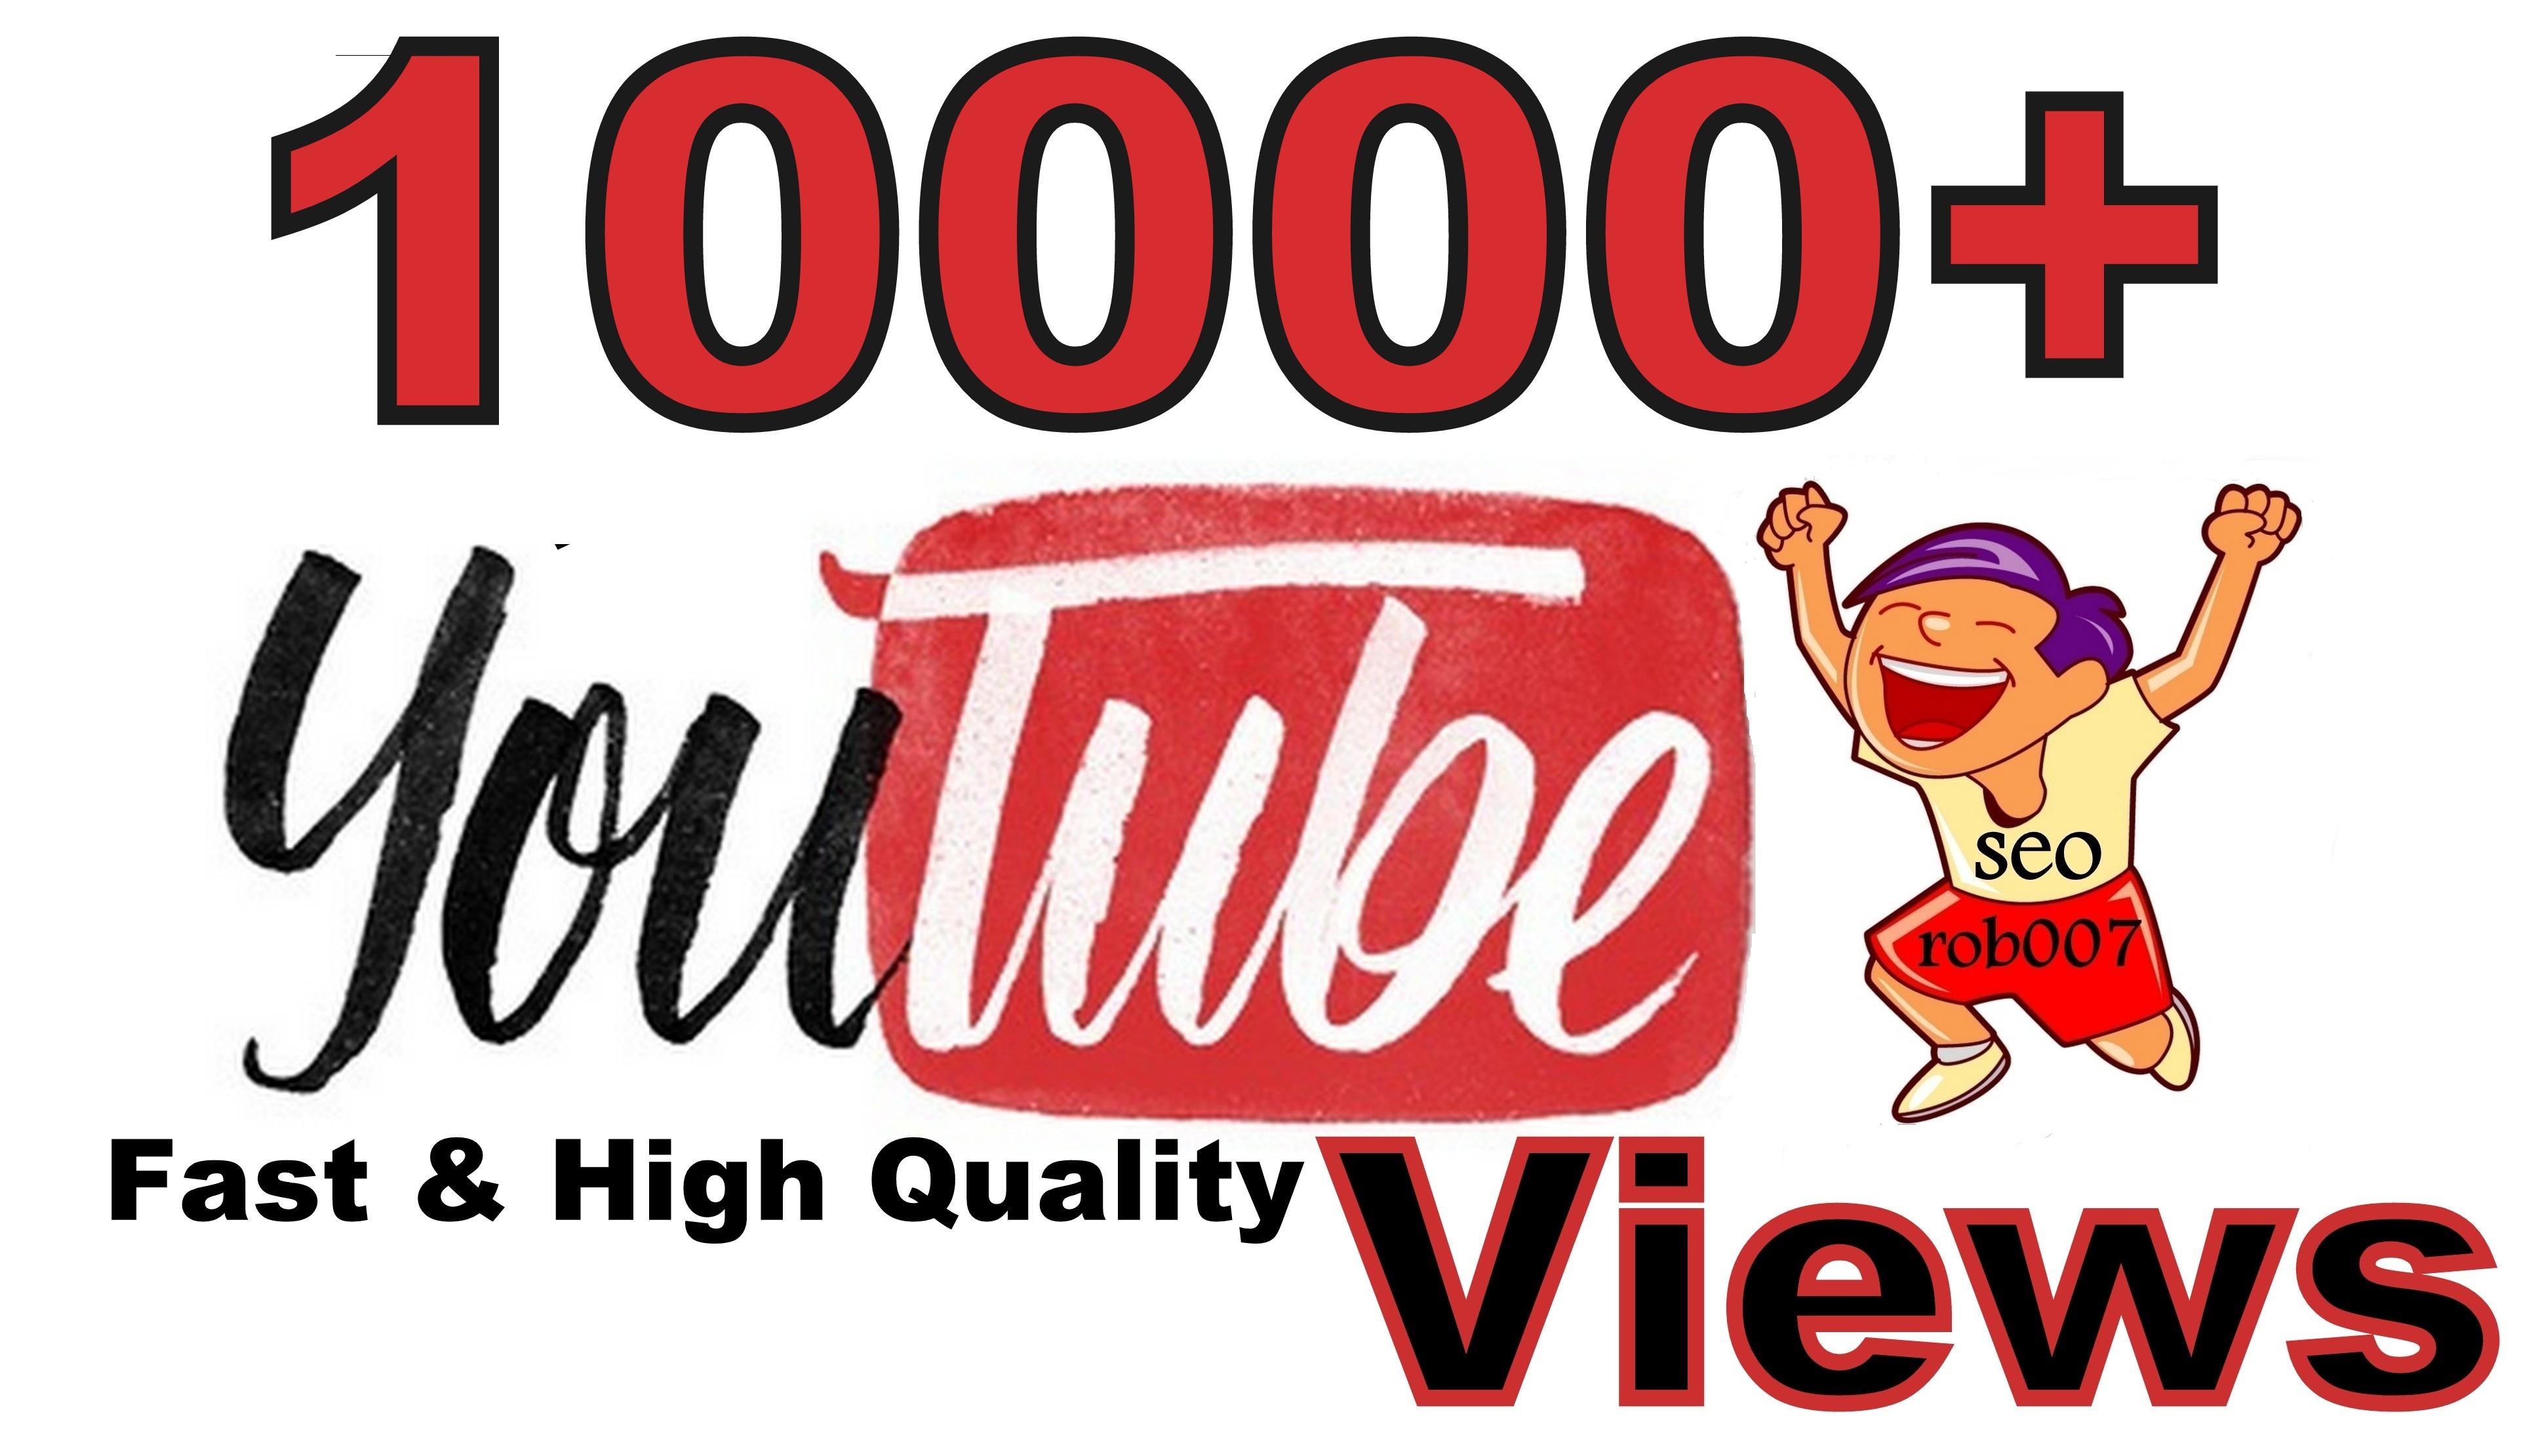 Safe 10000+ Y0uTube Video VlEWS Super Fast Promotion in 24-48 Hours